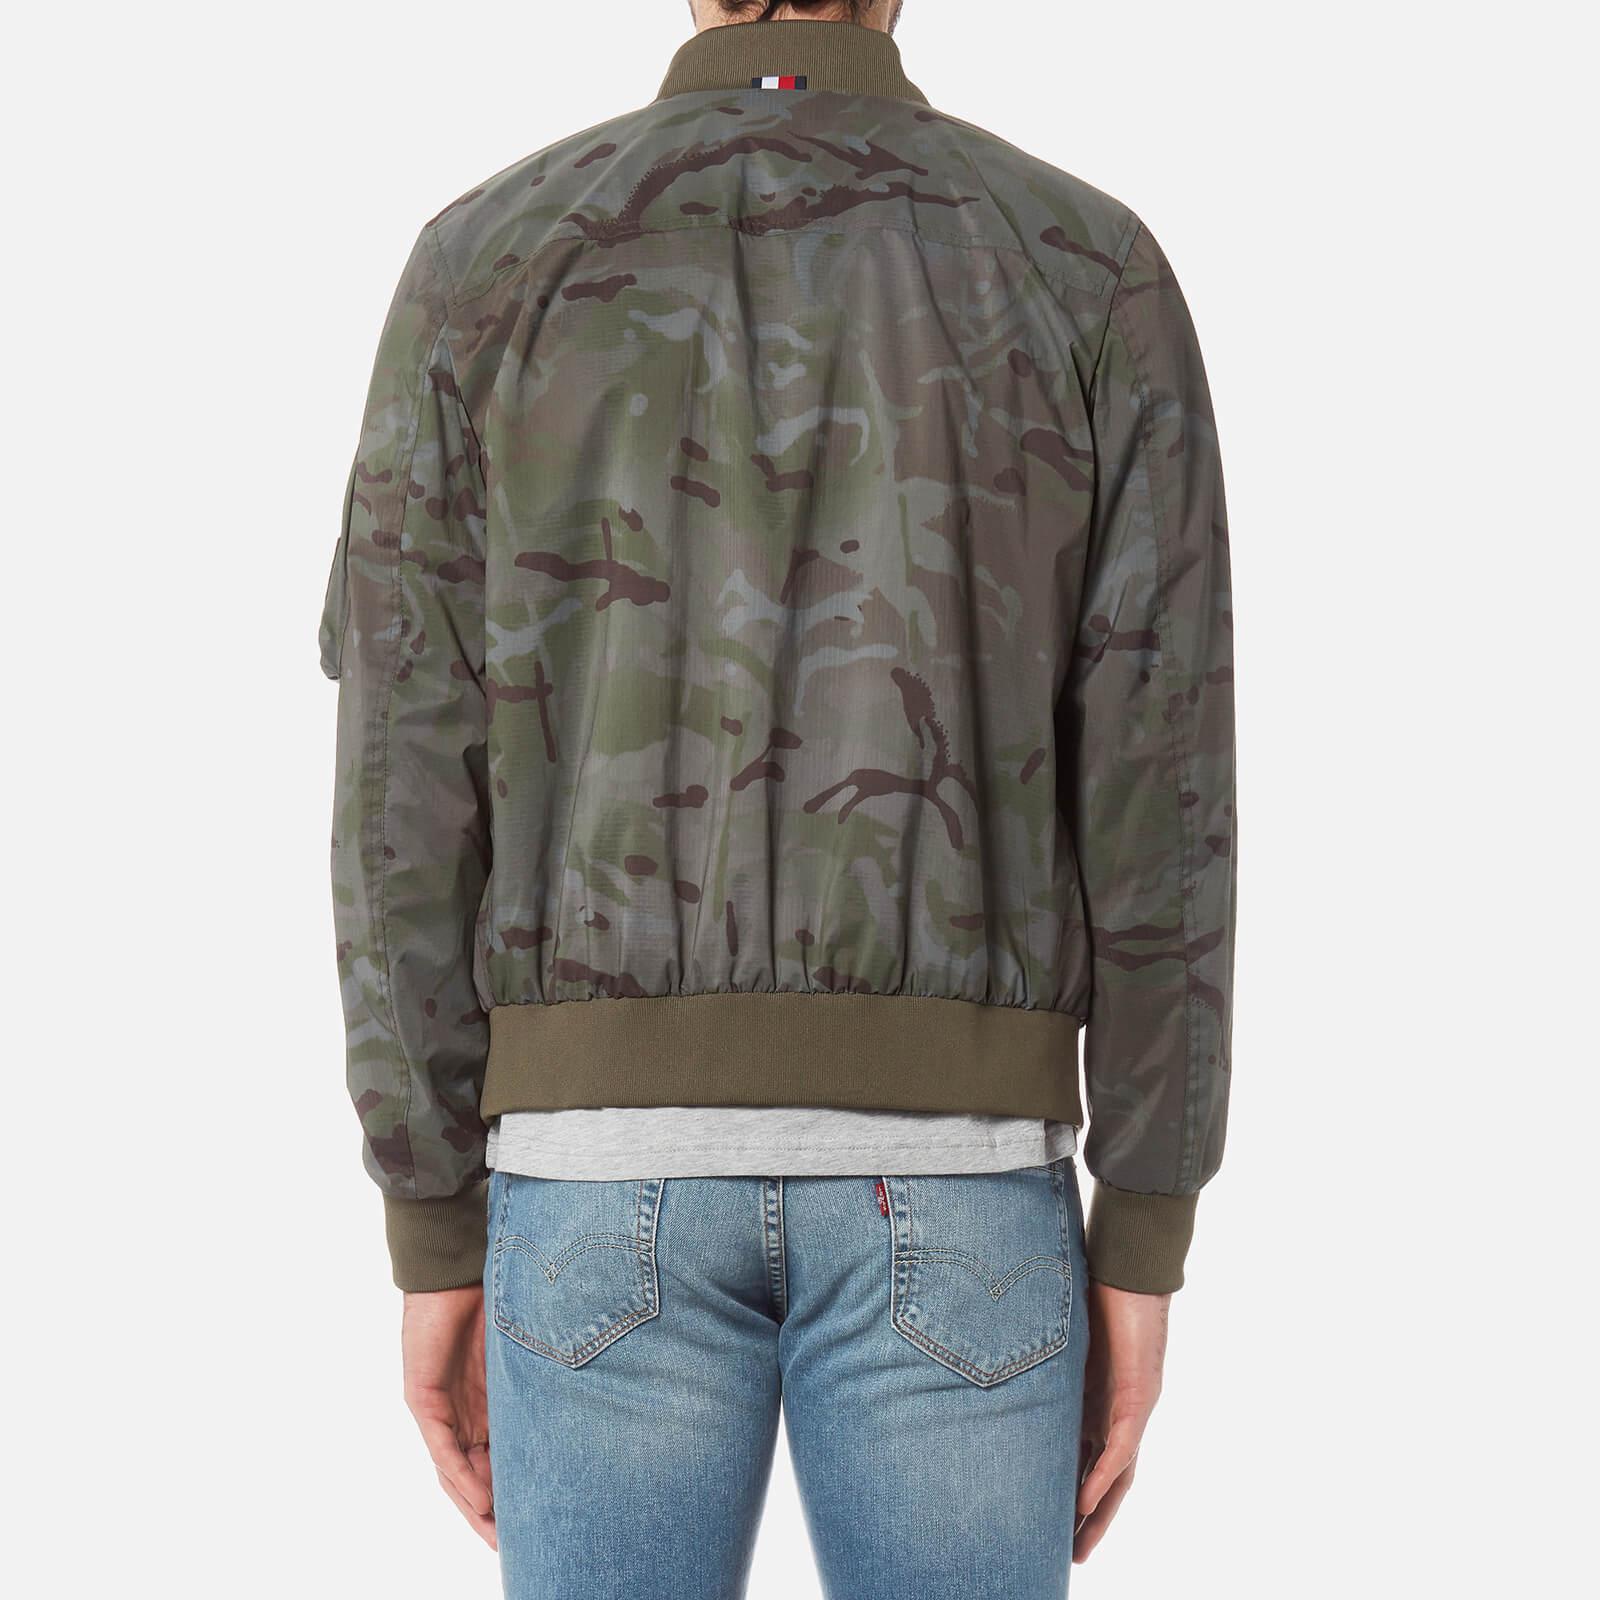 e8c699fb6 Tommy Hilfiger Green Camo Bomber Jacket for men